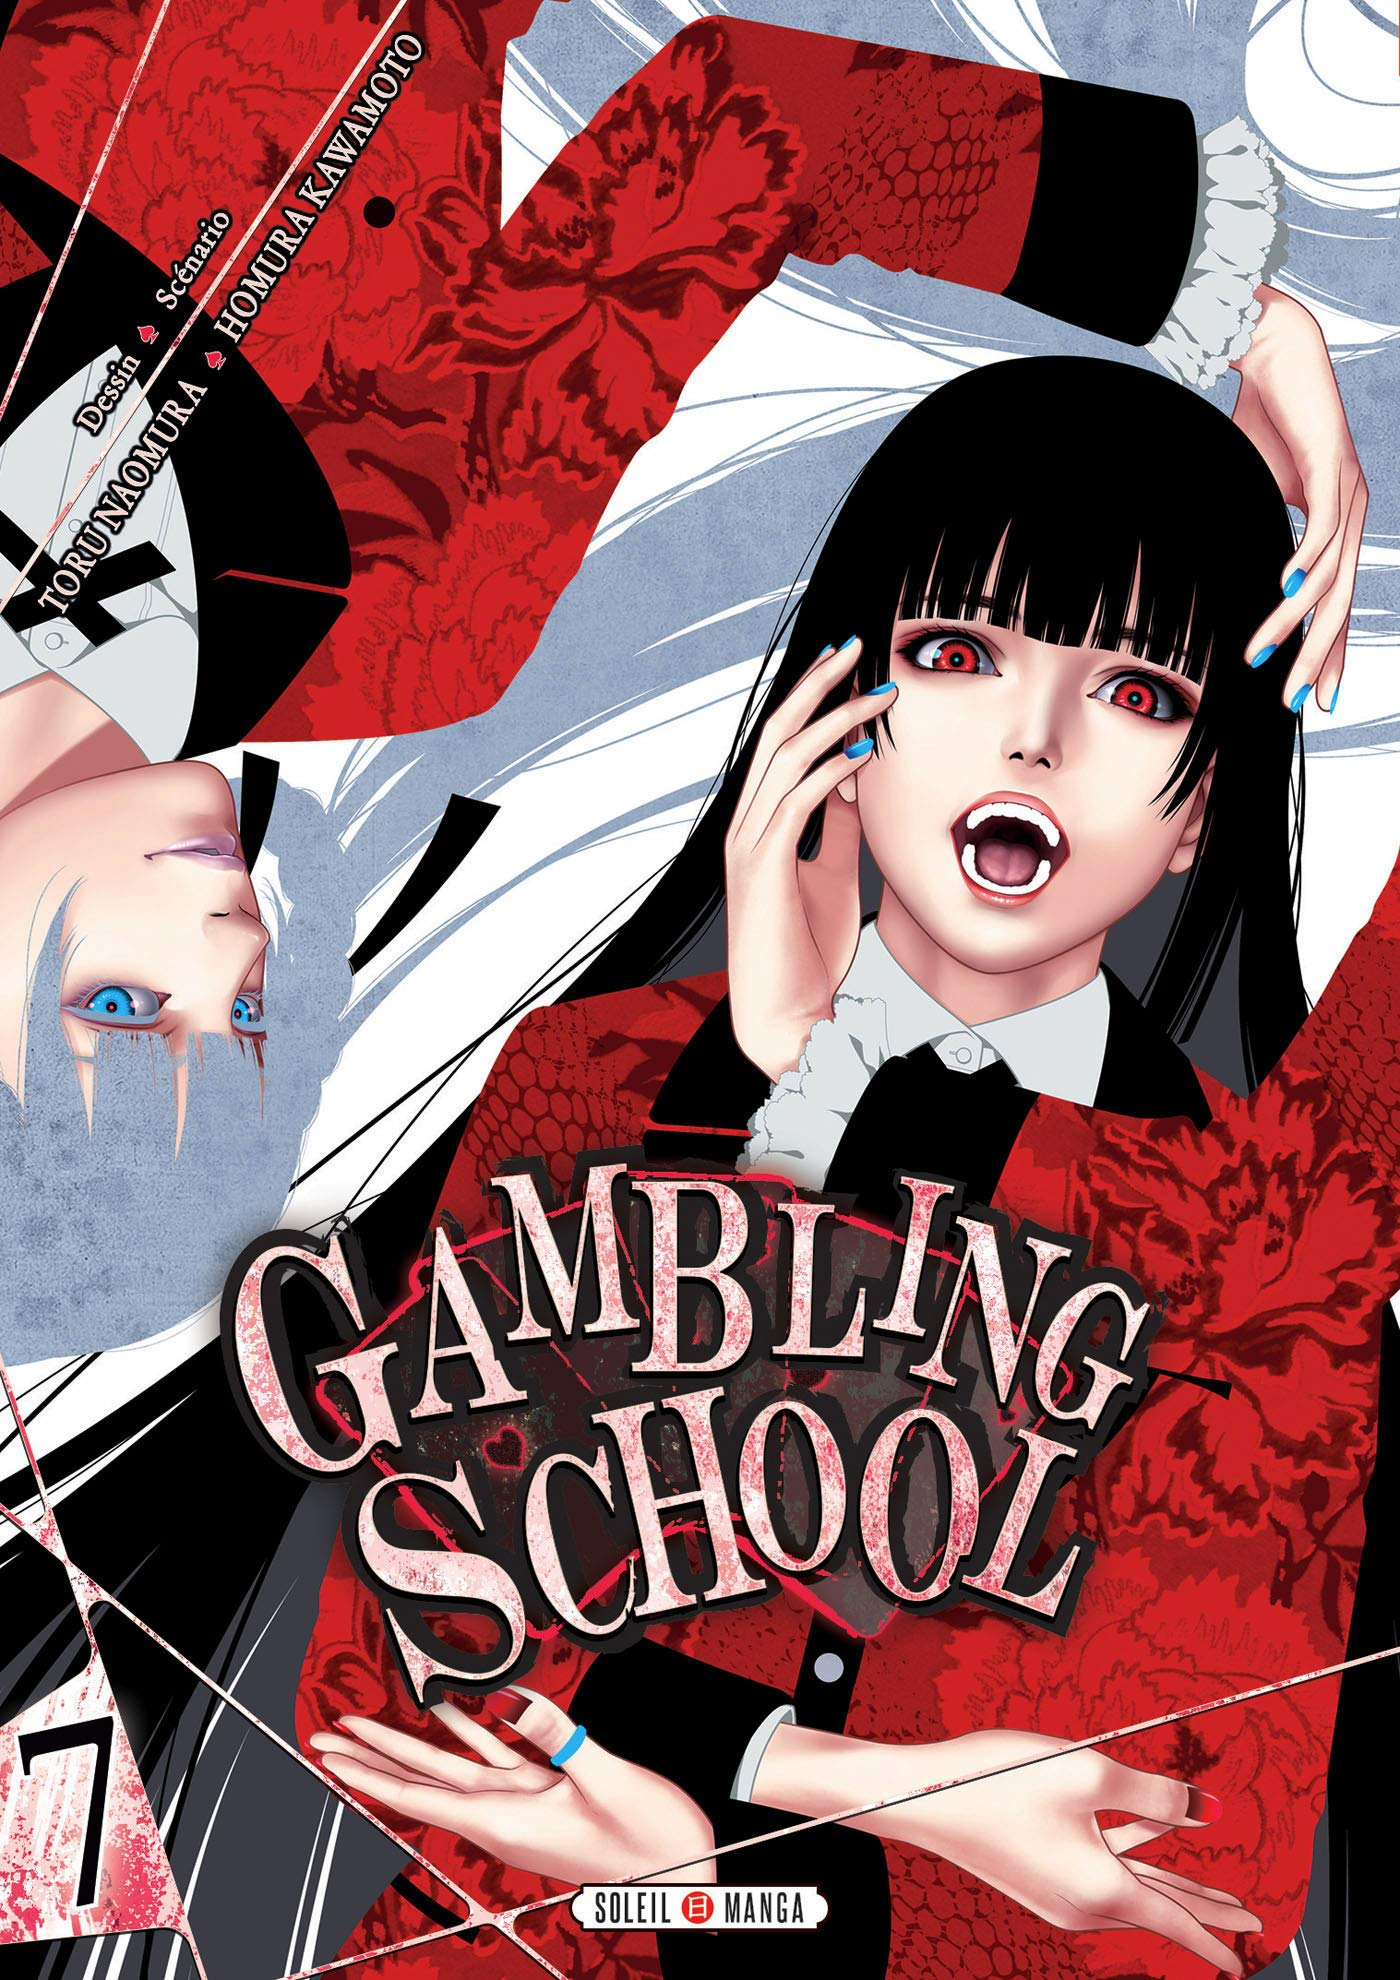 Gambling School 7